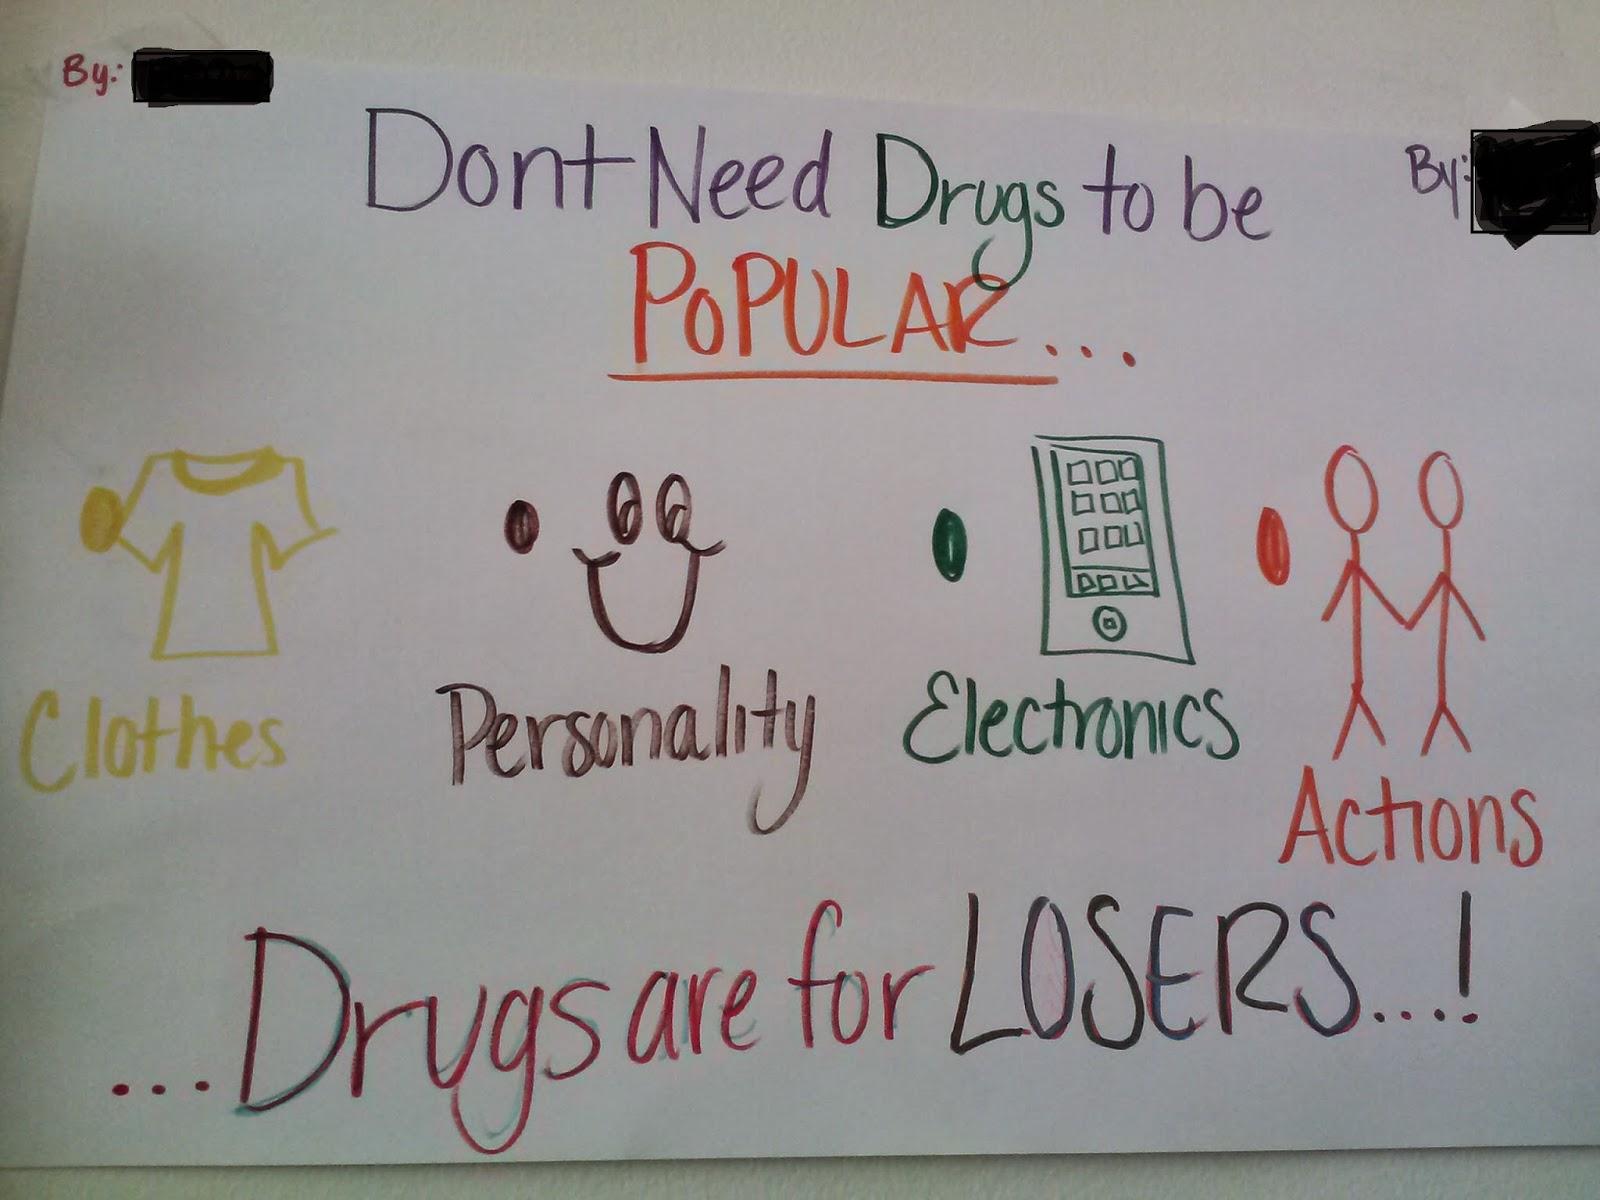 PSA Drug Abuse - YouTube